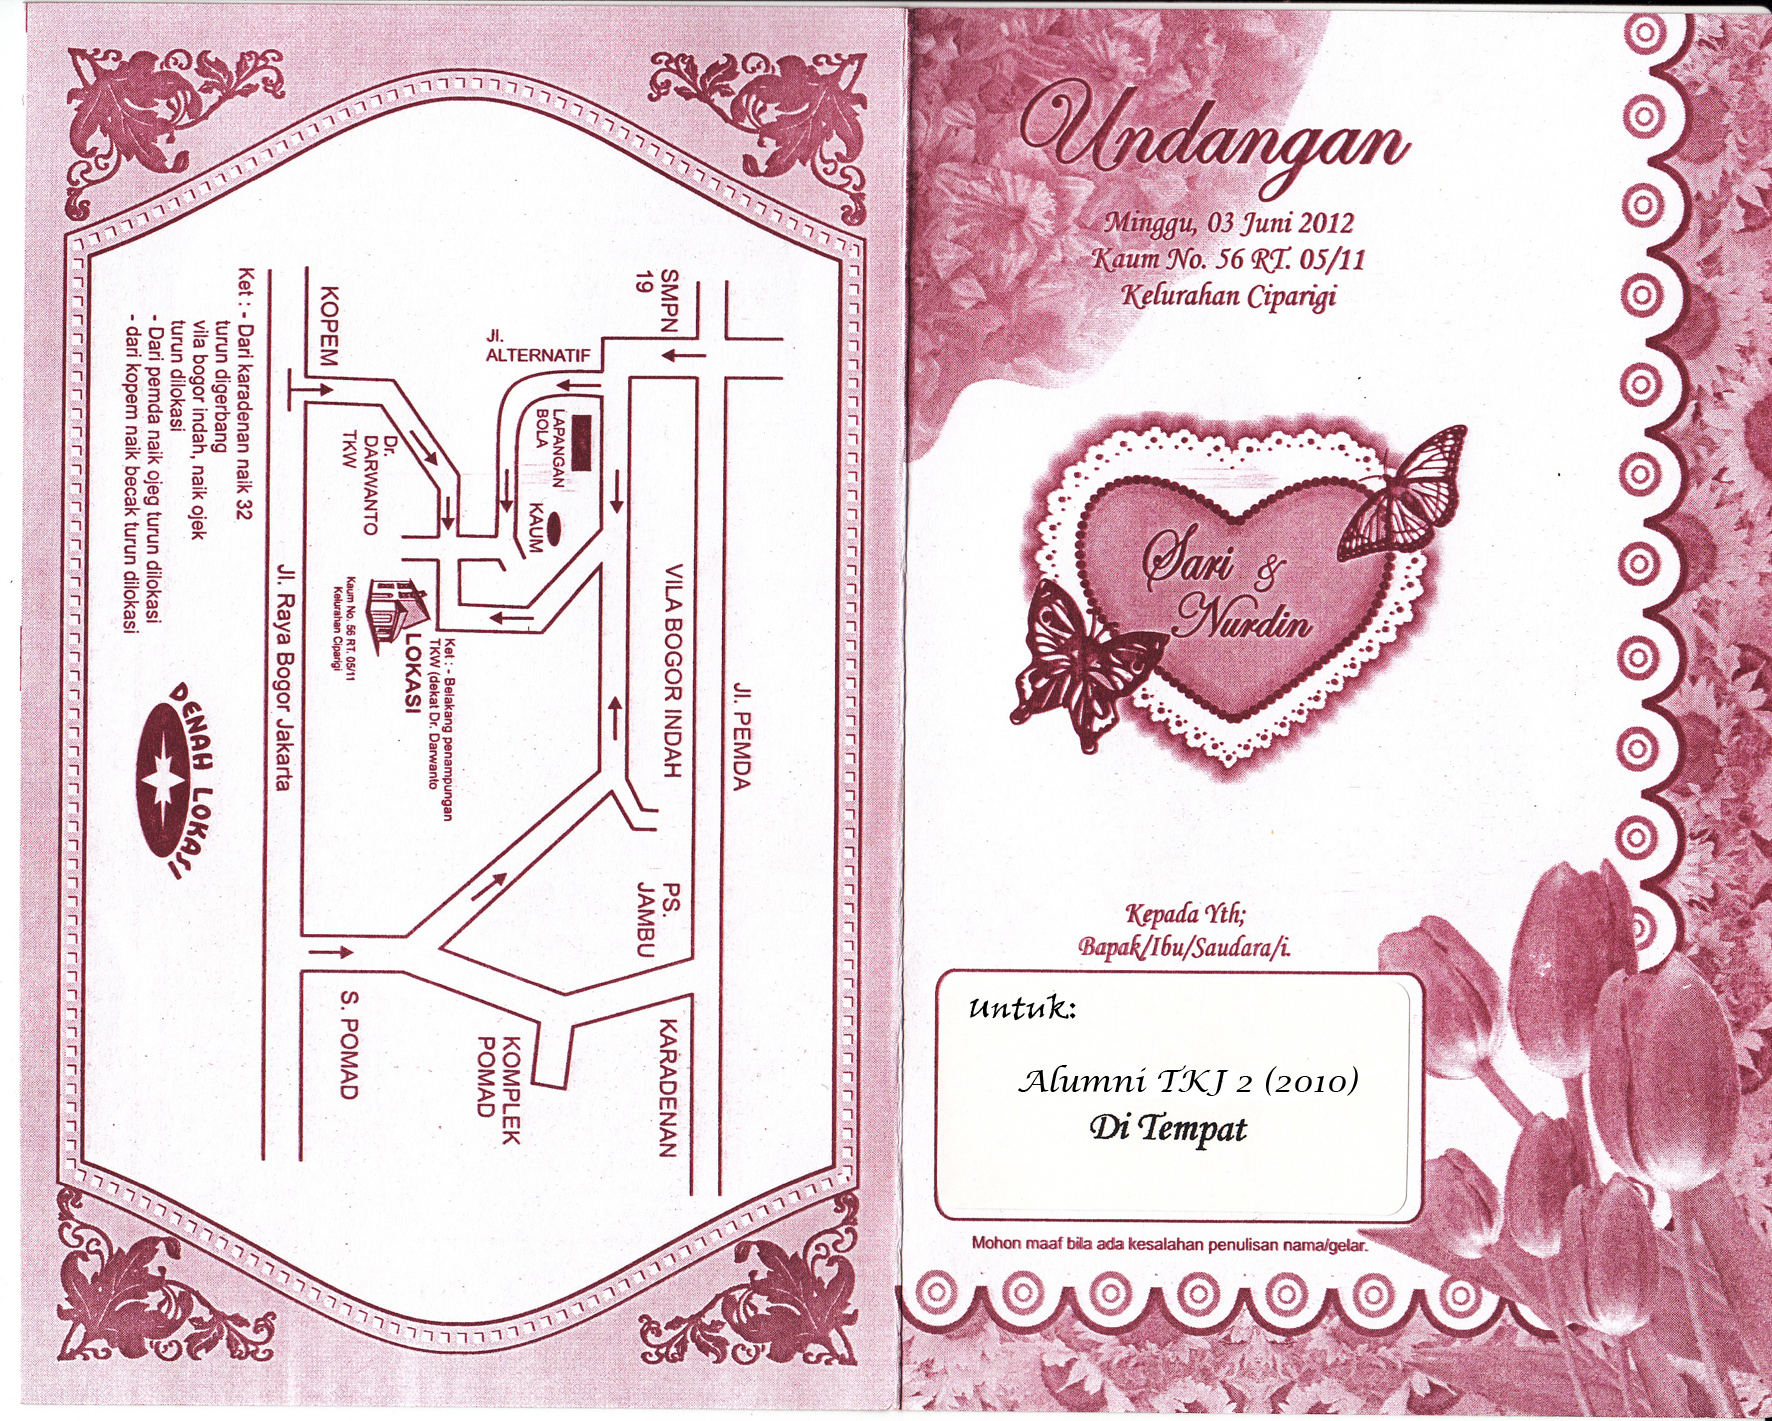 Undangan Pernikahan Sari Sartini Nawiez